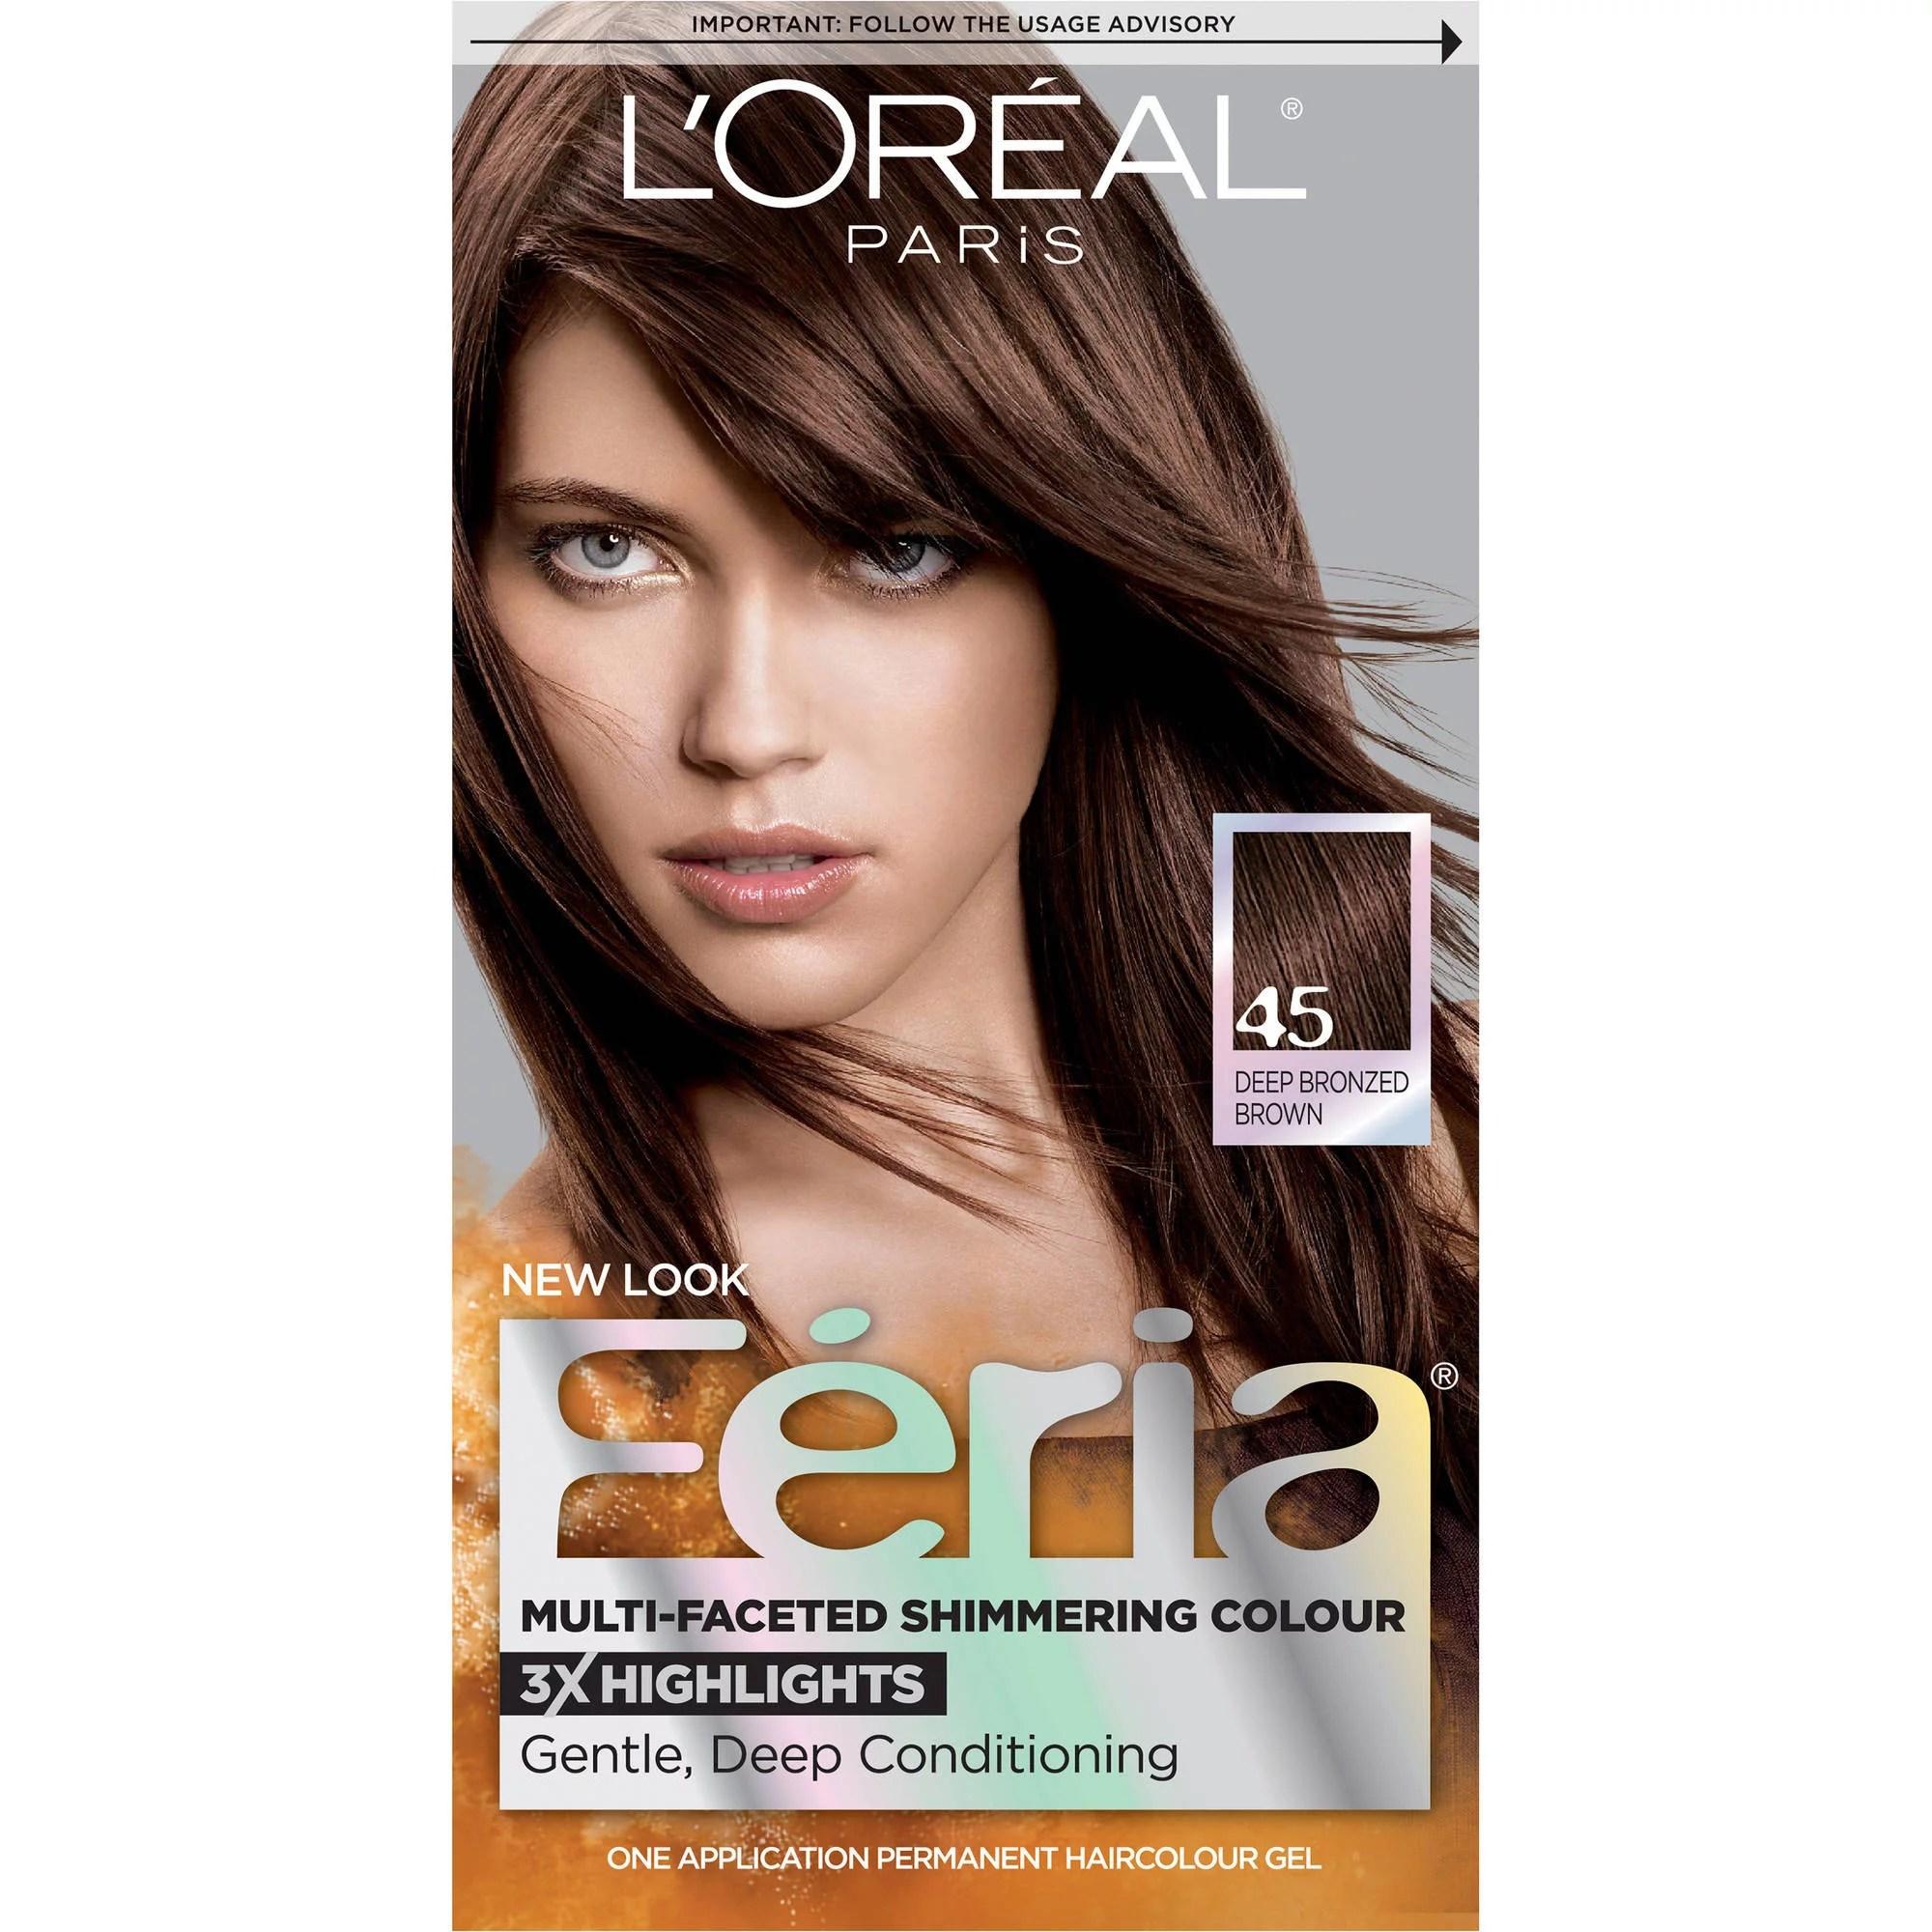 Loreal Feria Hair Color Shades